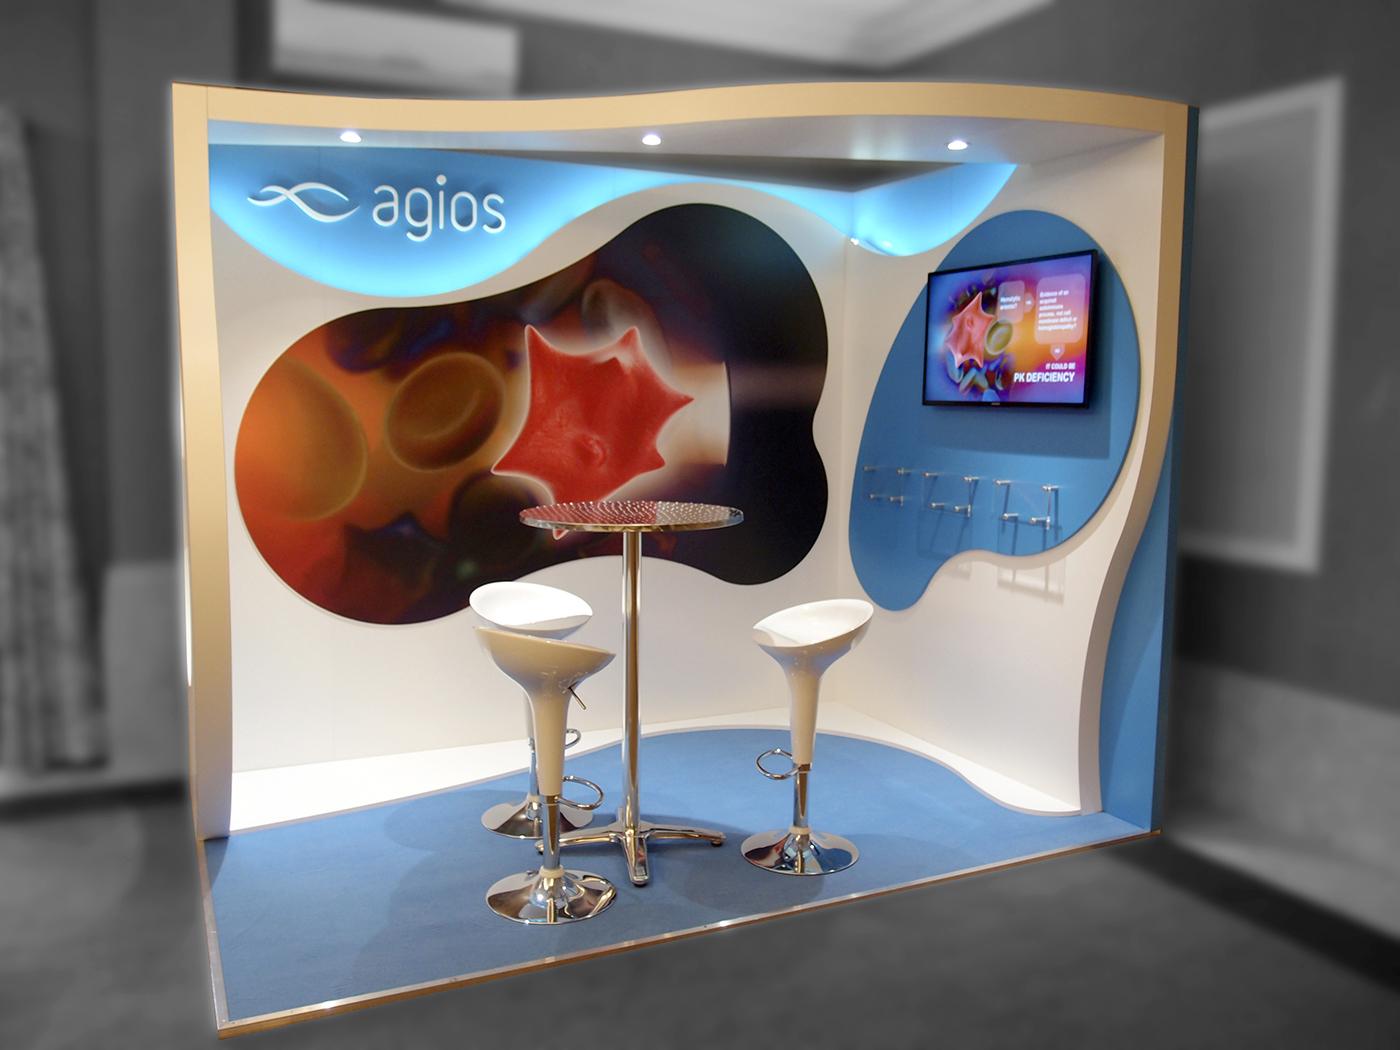 Exhibition Stand Poster Design : Exhibition stand design ox p